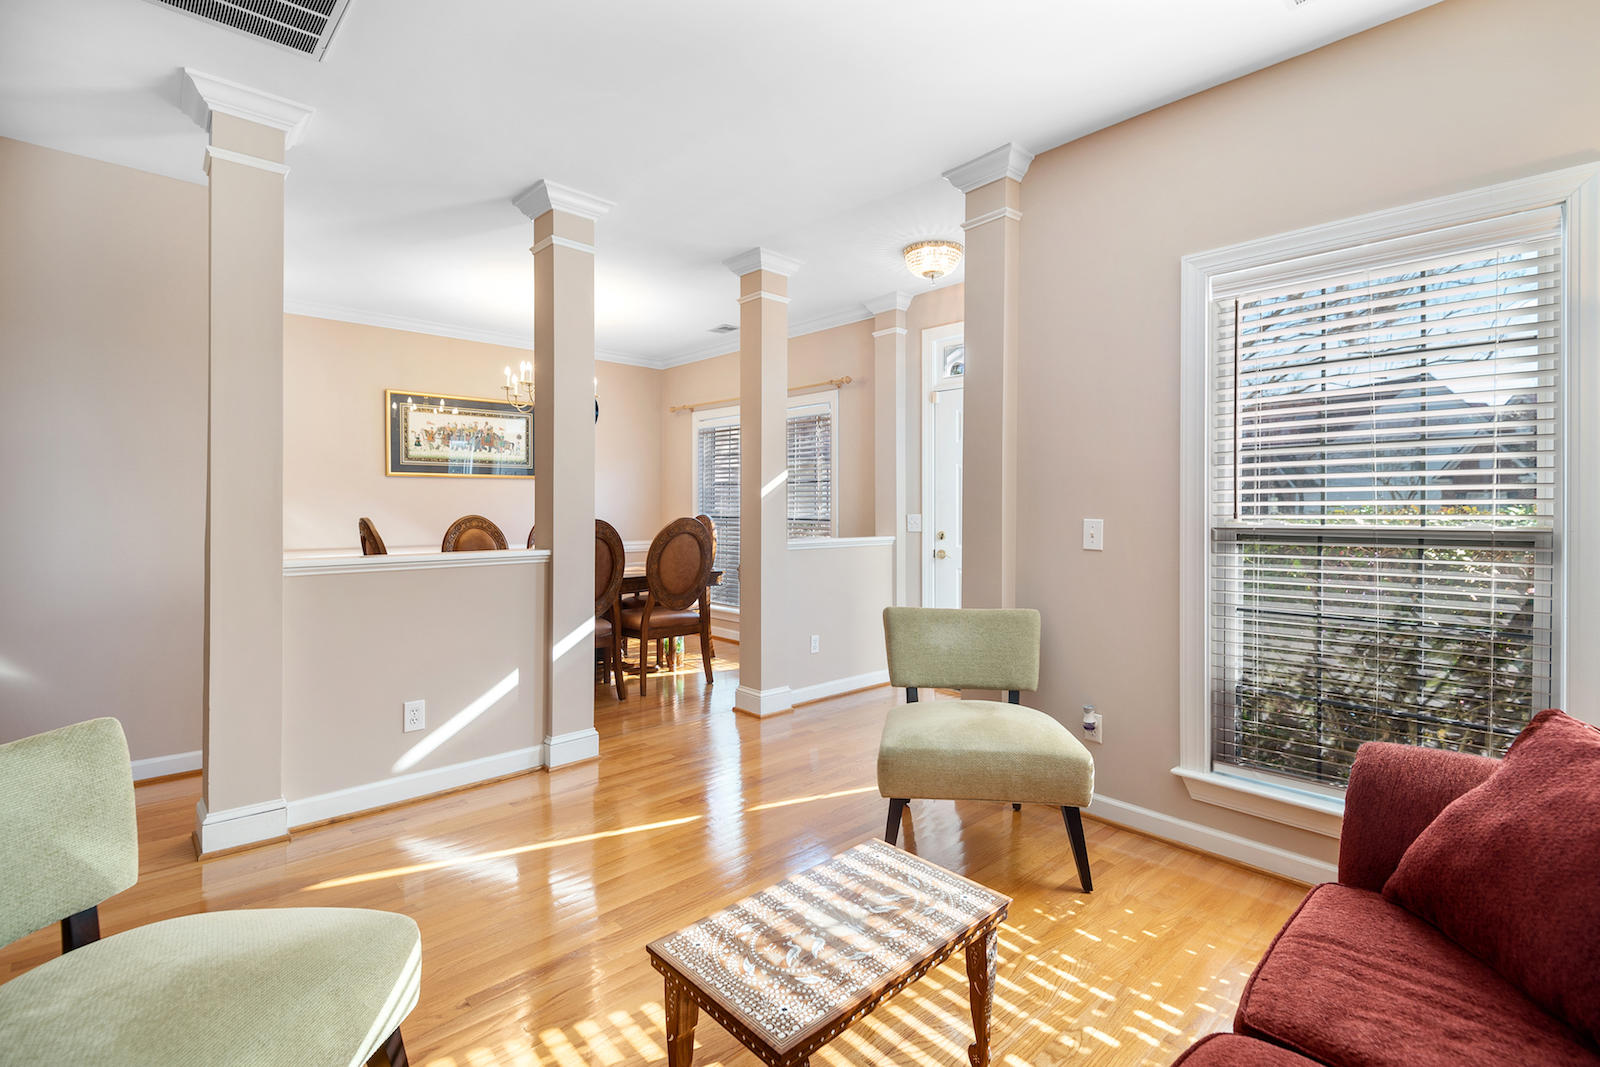 Belle Hall Homes For Sale - 195 Revetment, Mount Pleasant, SC - 26